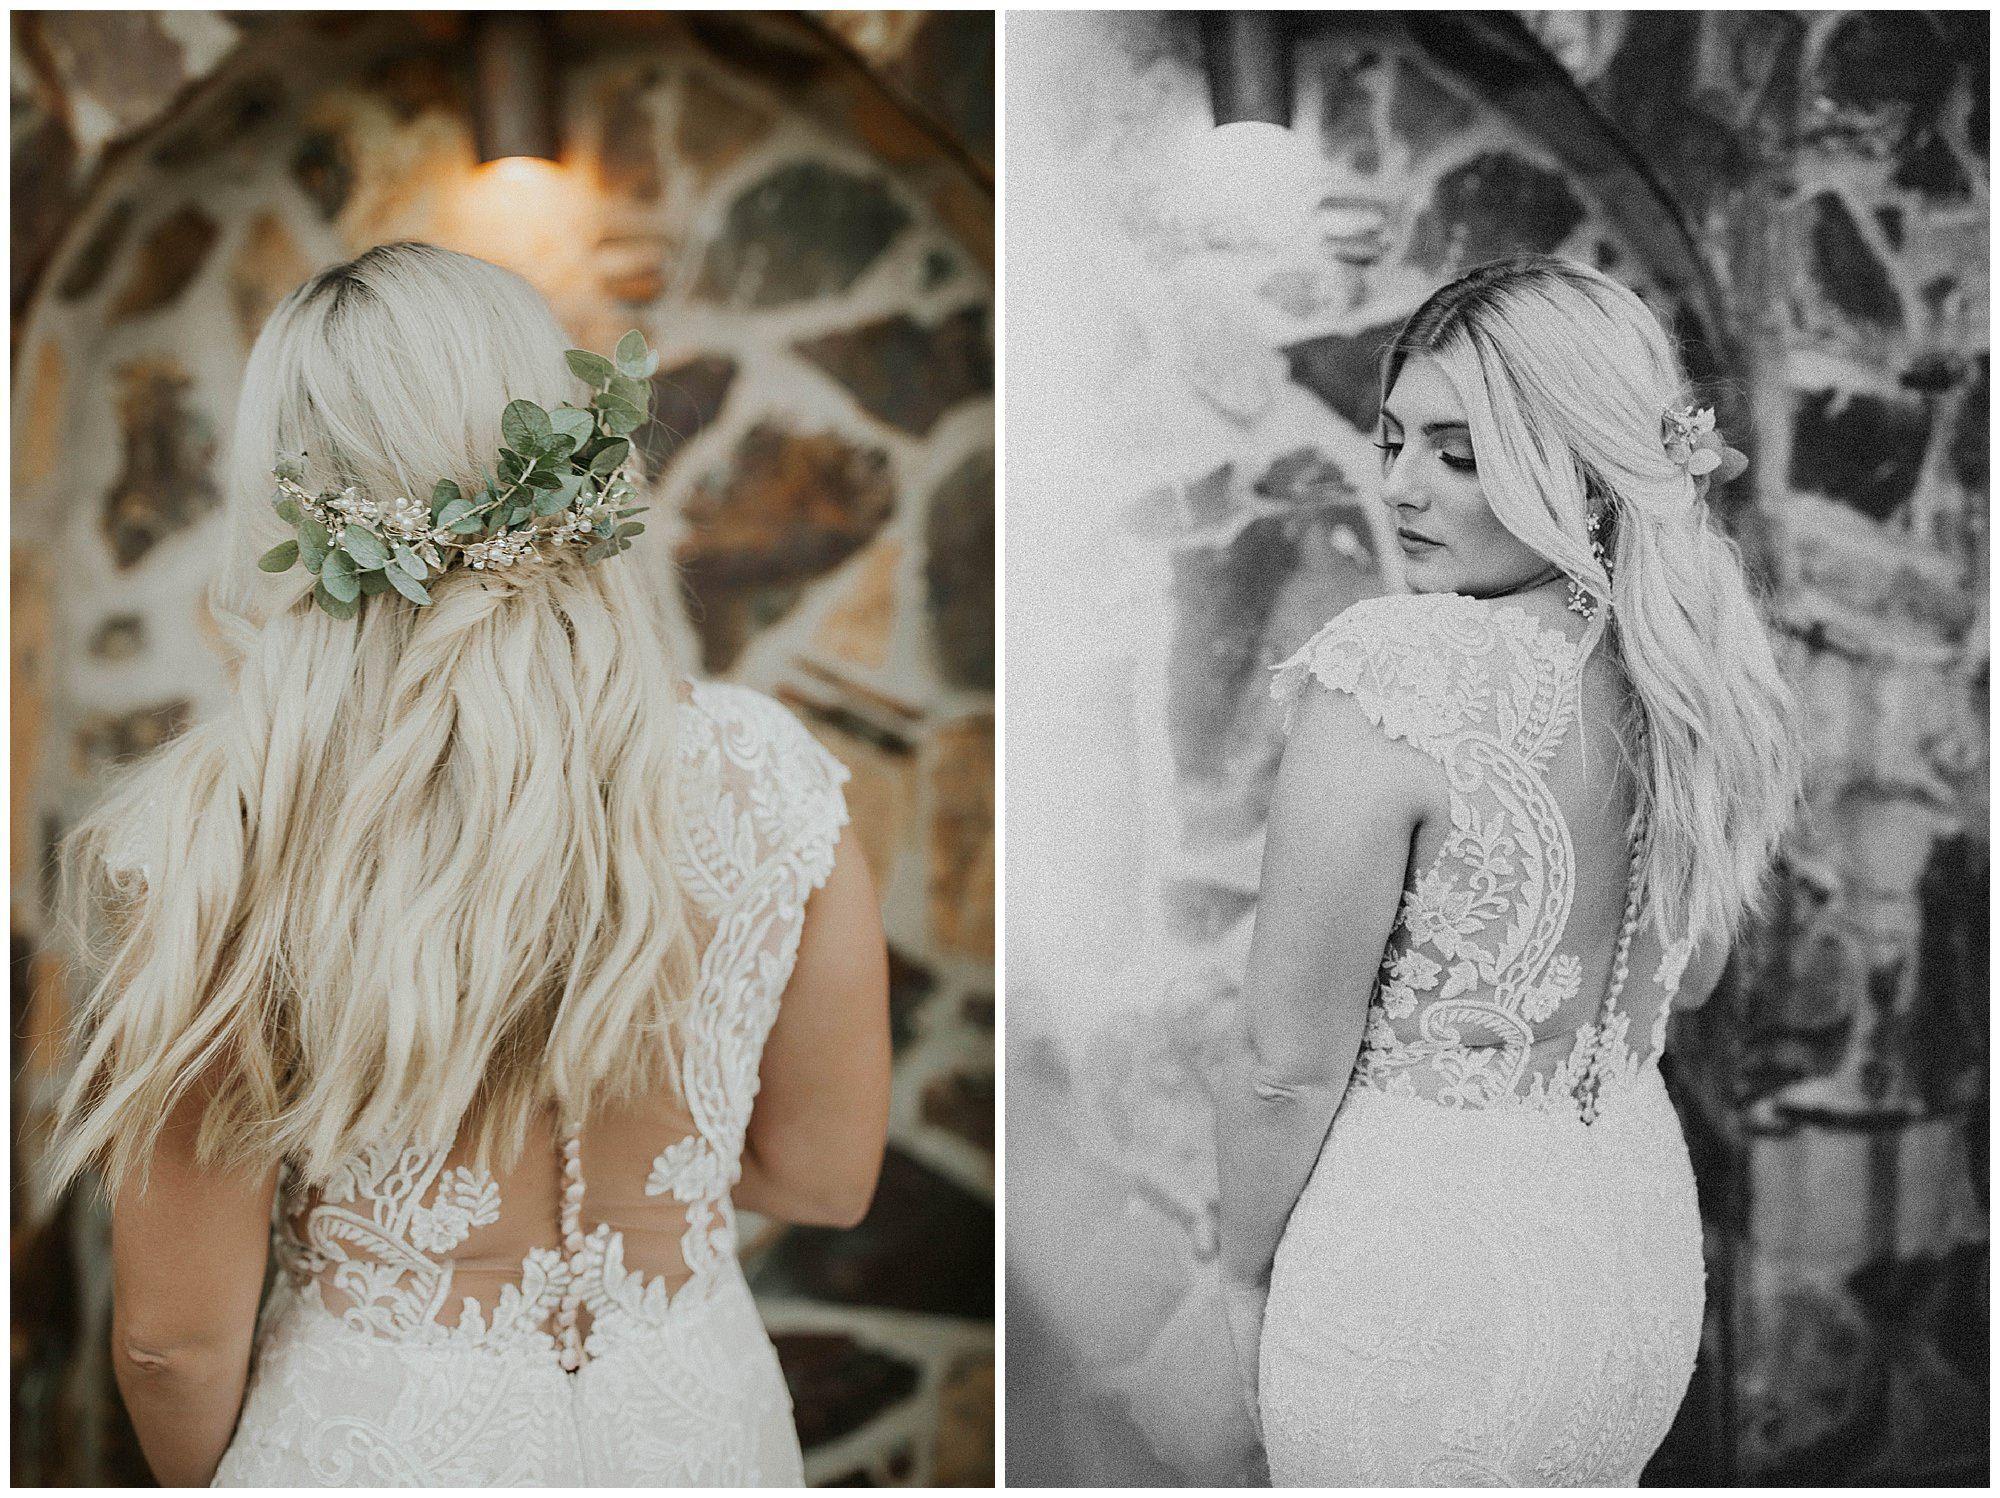 Ivory Bridal Photos at Wolf Lakes, Fresno